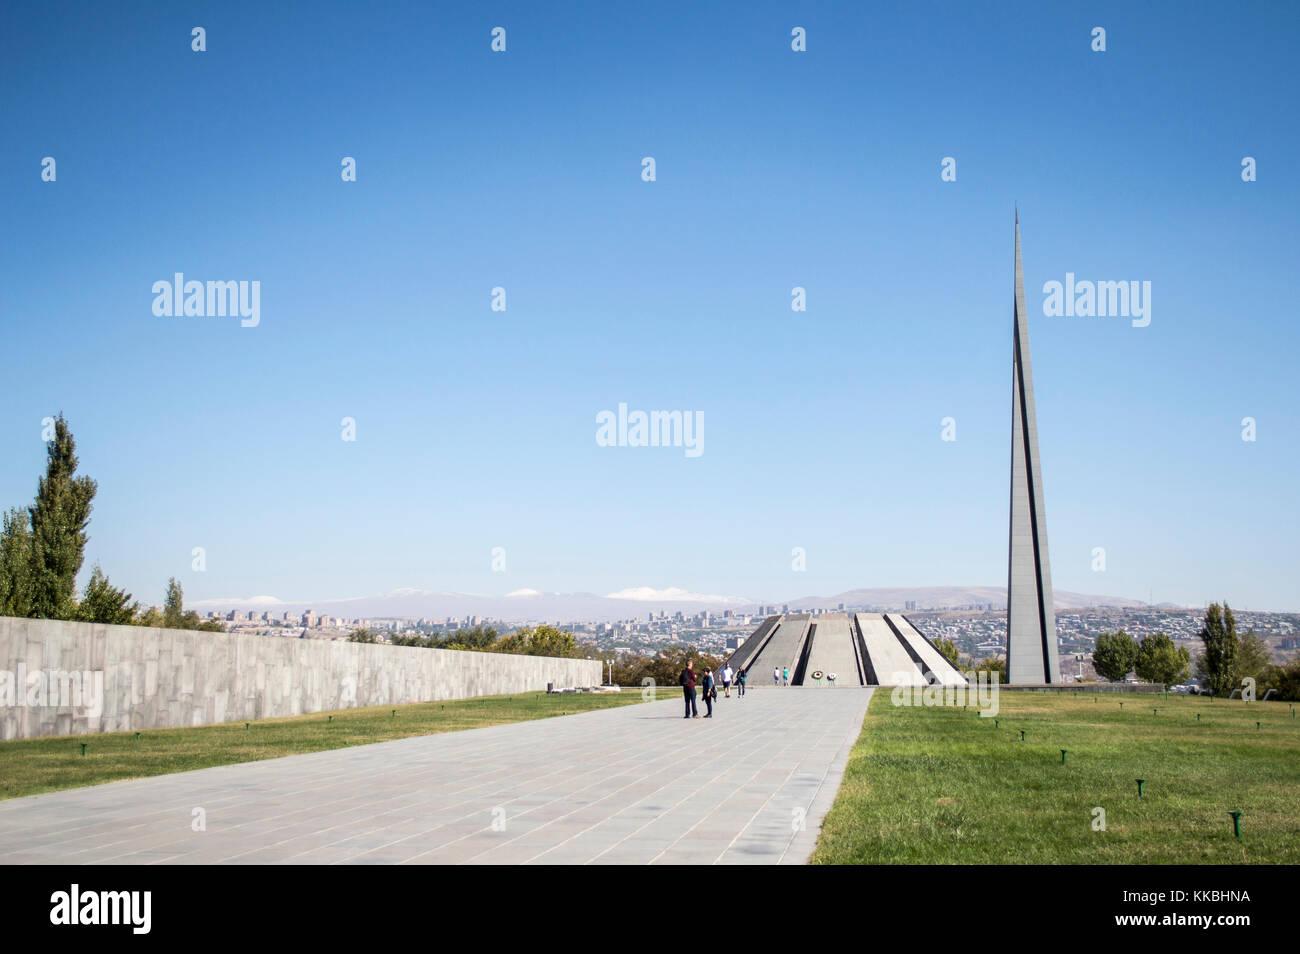 Yerevan, Armenia - October 8, 2017: Tsitsernakaberd - the Armenian Genocide Memorial in Yerevan, Armenia. Built - Stock Image